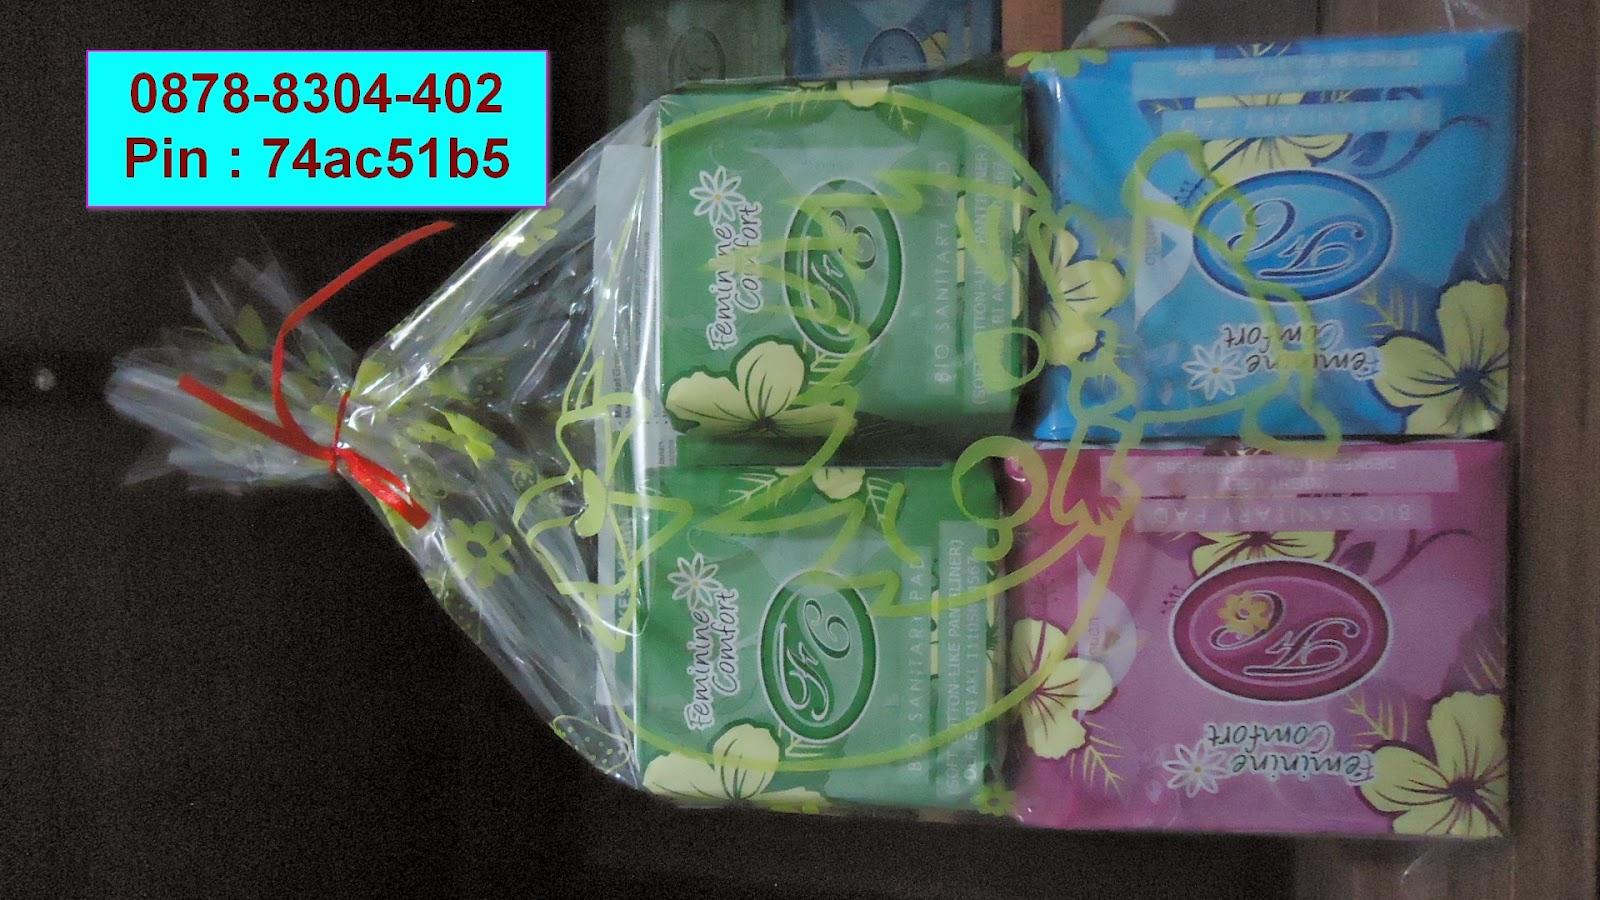 Distributor Avail Tangerang Selatan Maret 2014 Pantyliner Eceran Agen Pembalut Herbal Jual Sehat